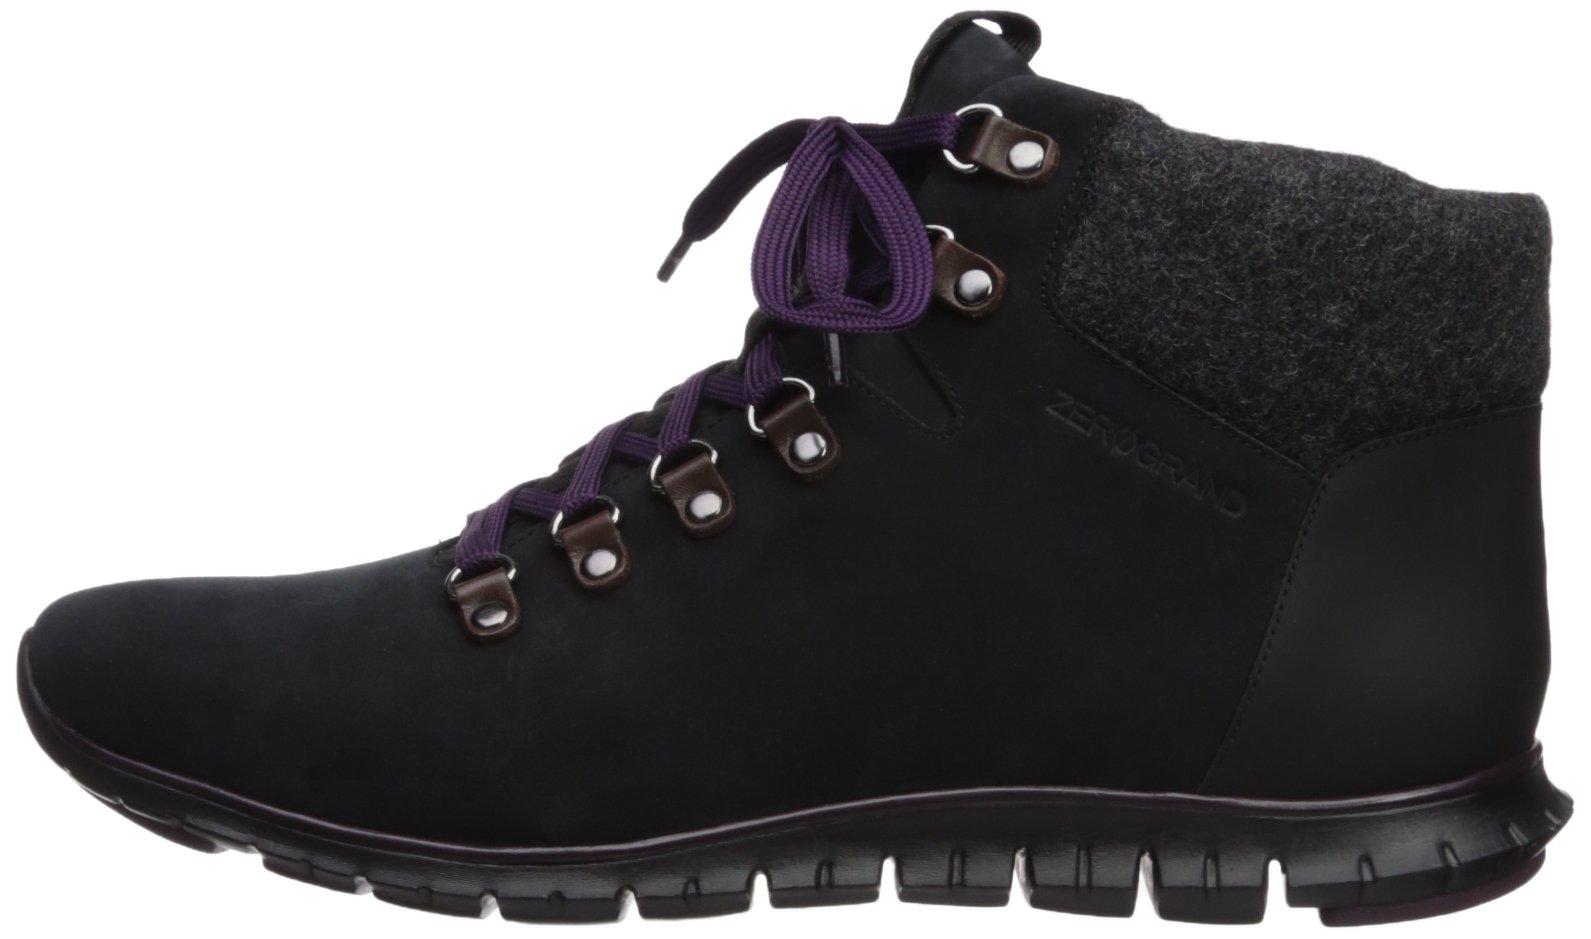 Cole Haan Women's Zerogrand Hikr Boot, Black, 9.5 B US by Cole Haan (Image #5)